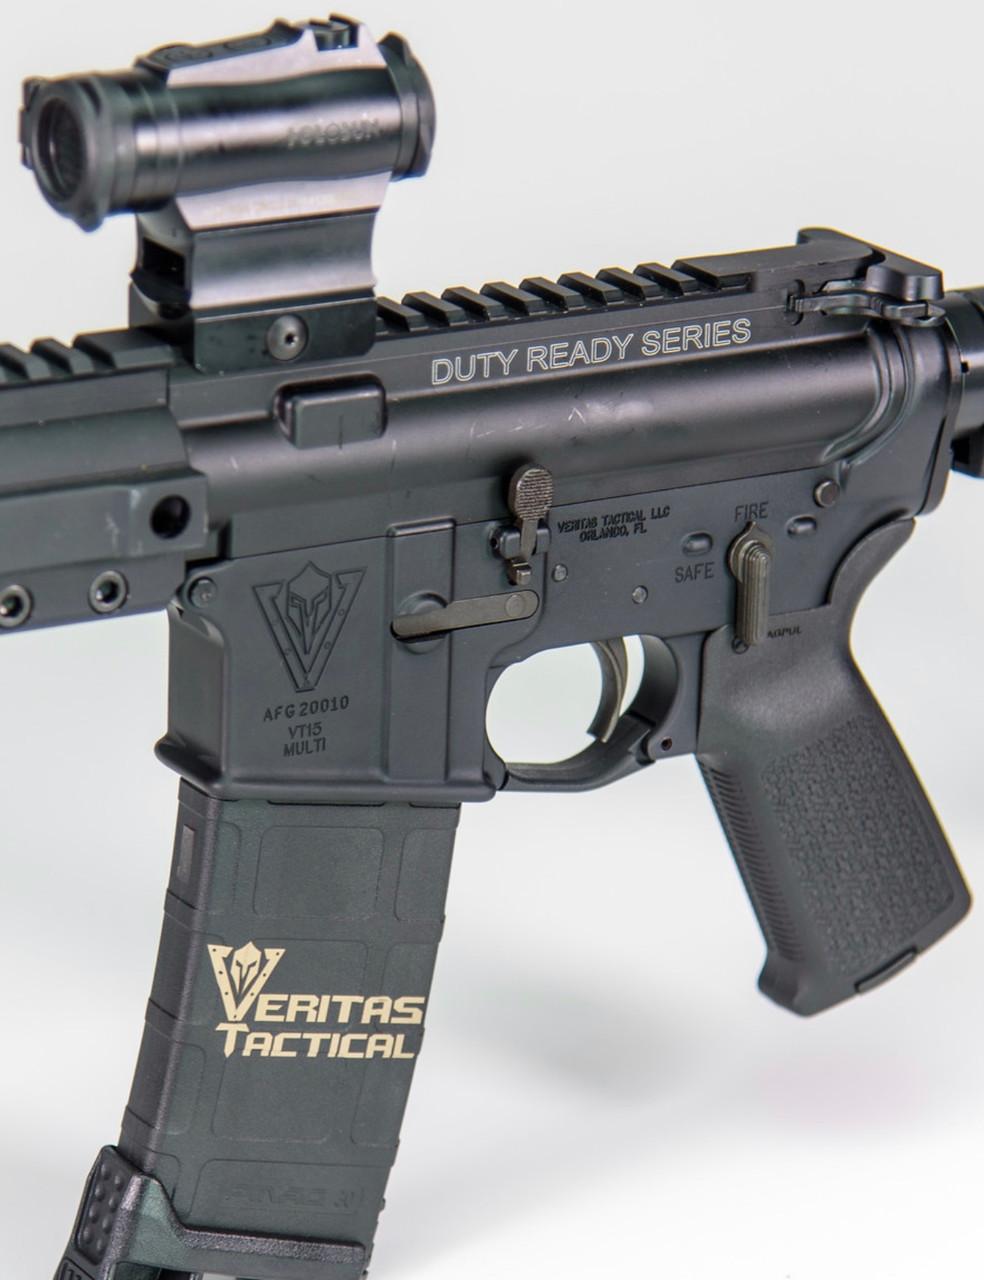 VT15 Duty Ready 16R